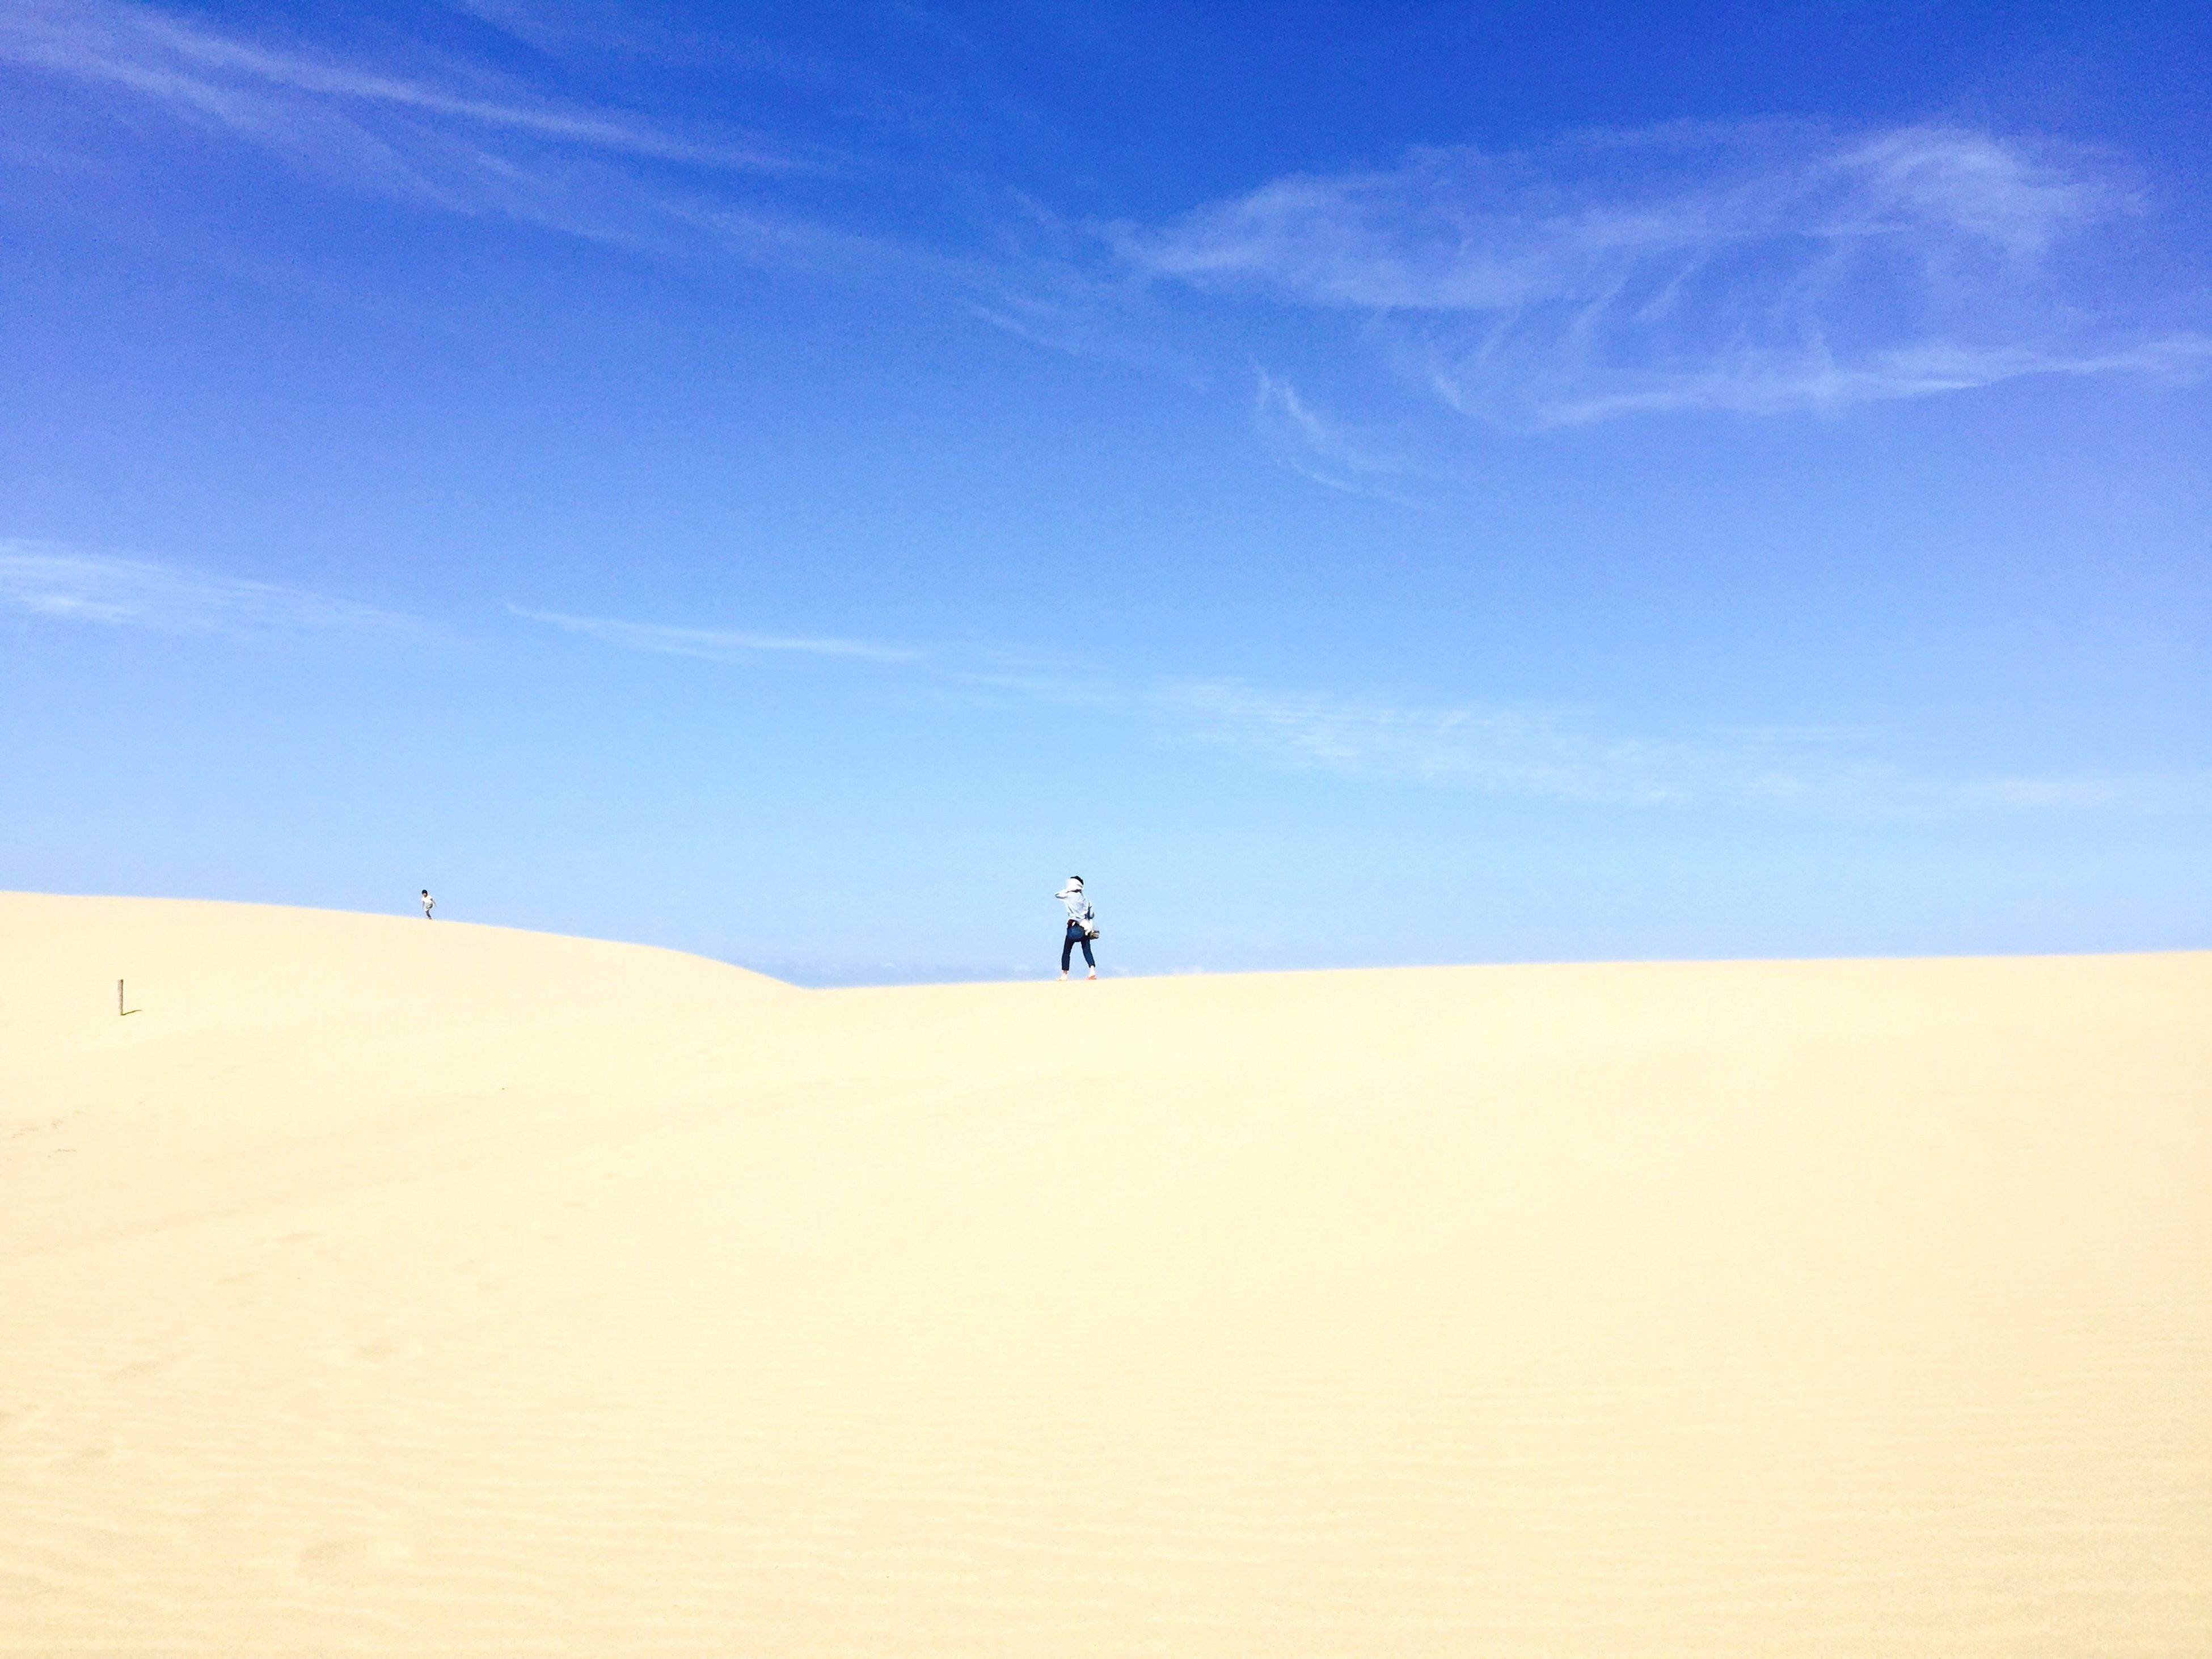 sand, tranquil scene, tranquility, leisure activity, sky, lifestyles, men, scenics, landscape, unrecognizable person, beauty in nature, nature, desert, blue, beach, sand dune, remote, tourist